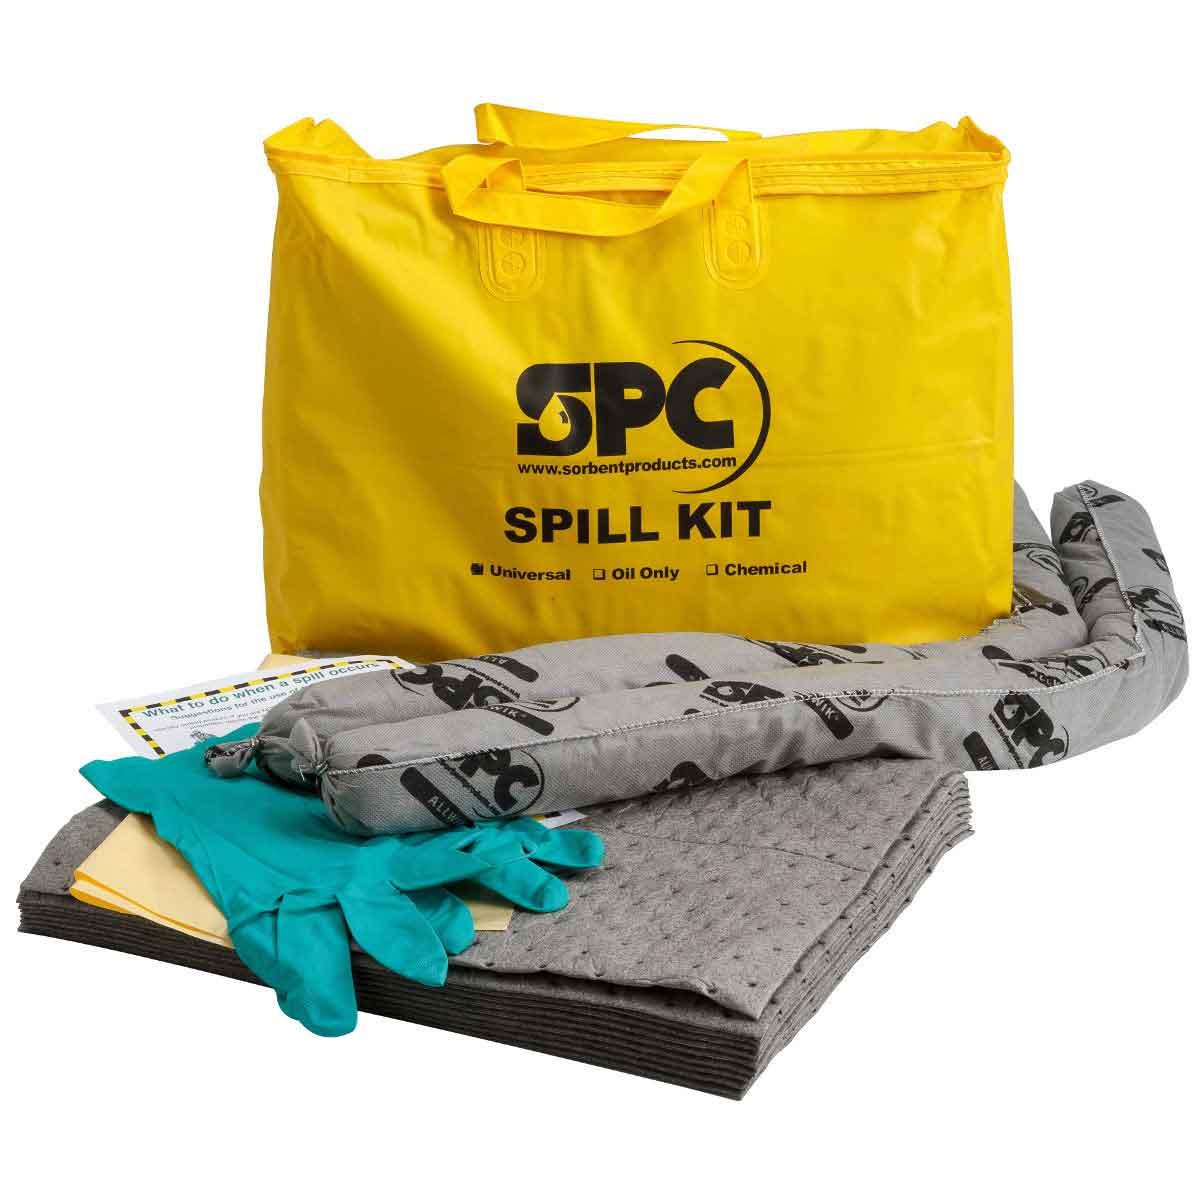 Brady SKA-PP Portable Economy Spill Kit - Universal Allwik